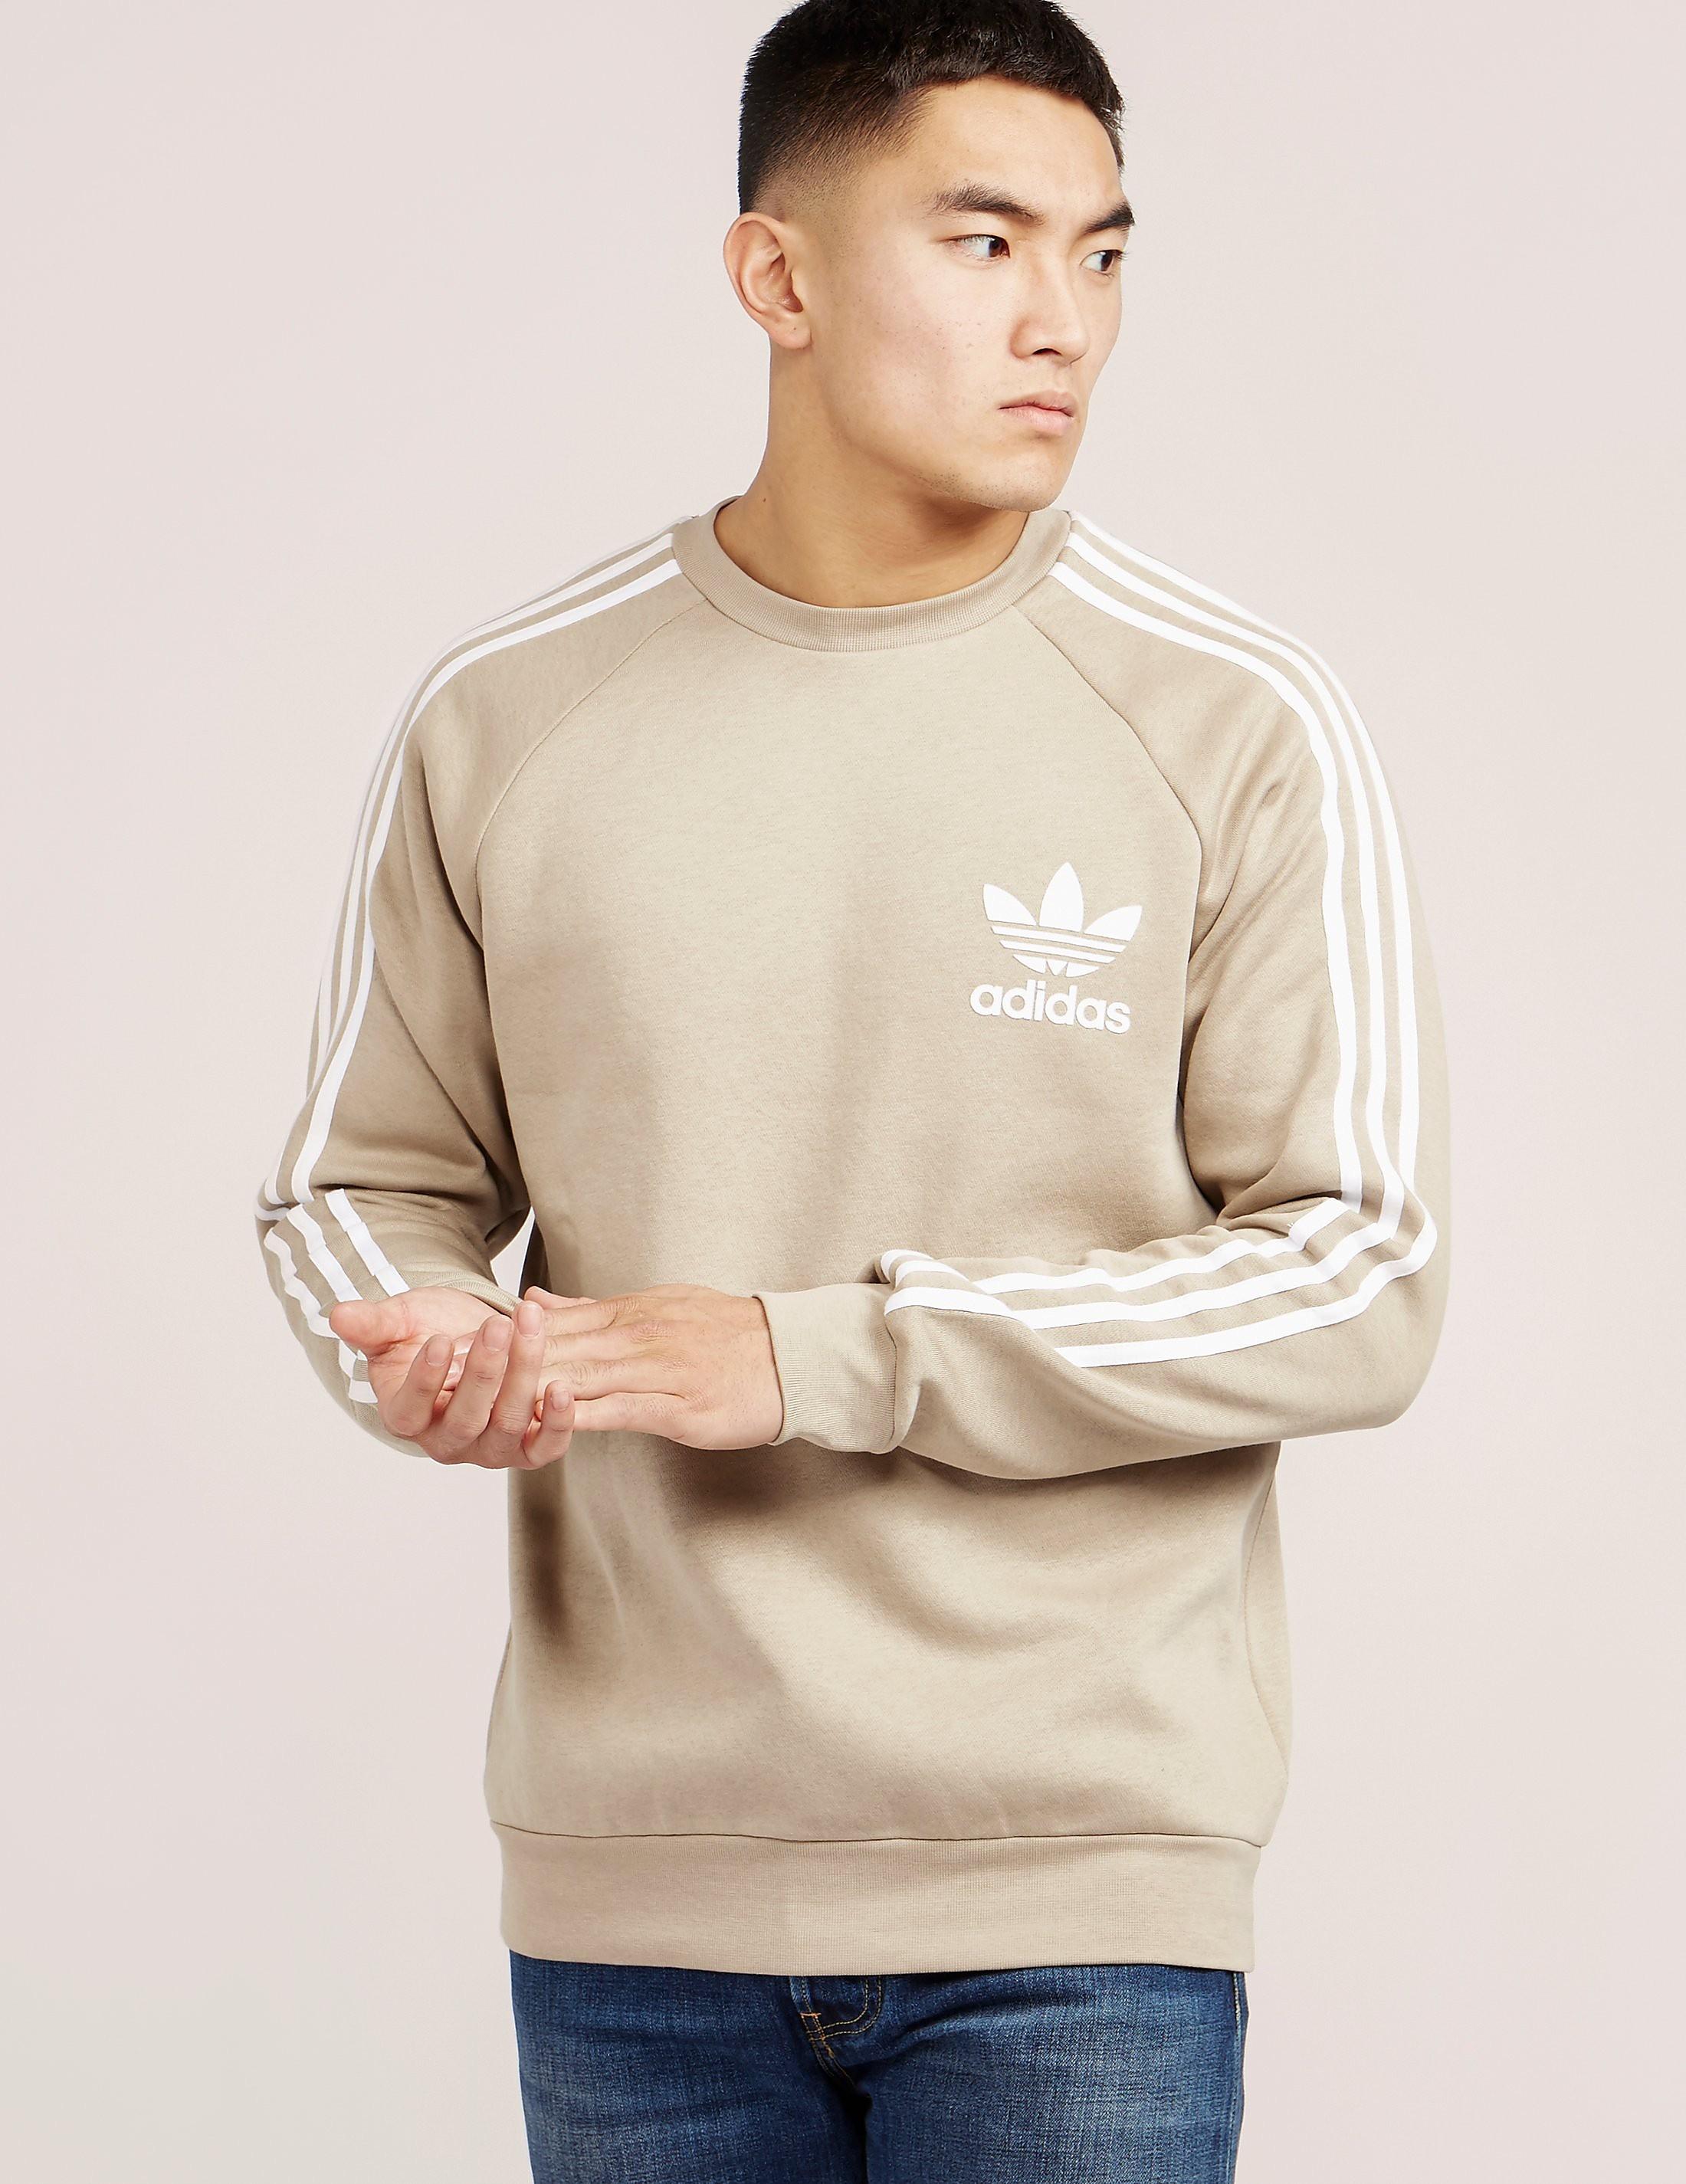 adidas Originals Crew Neck Sweatshirt